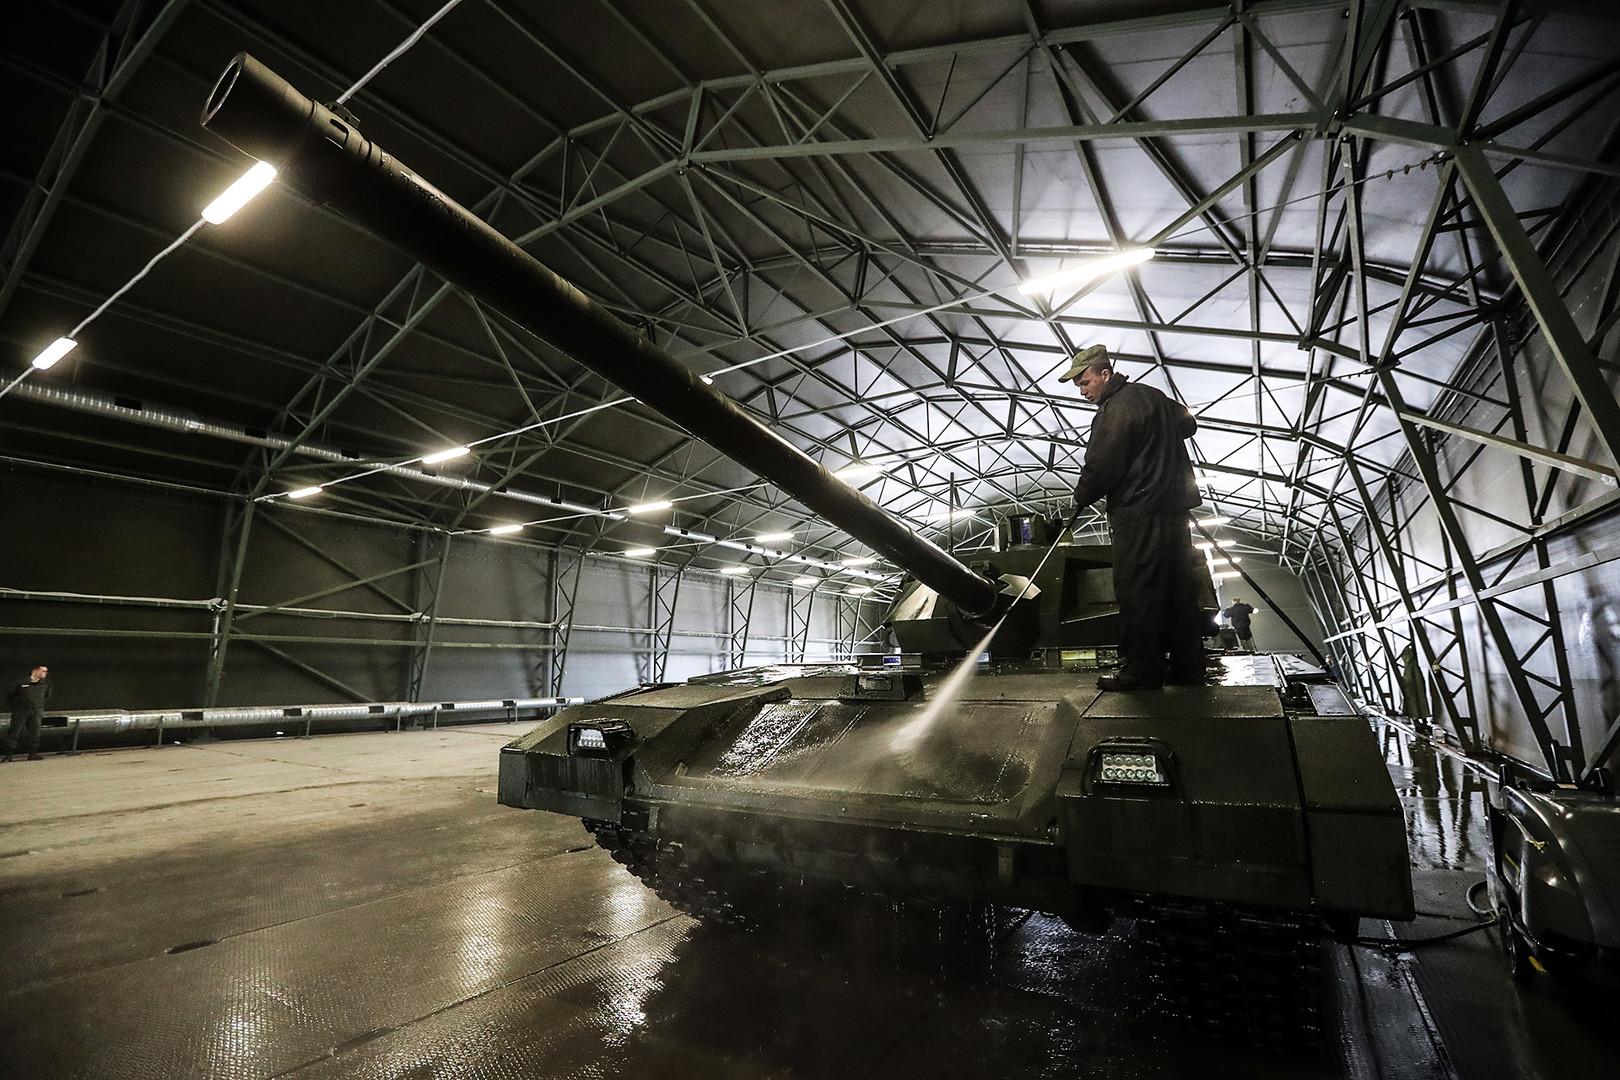 El tanque T-14 Armata